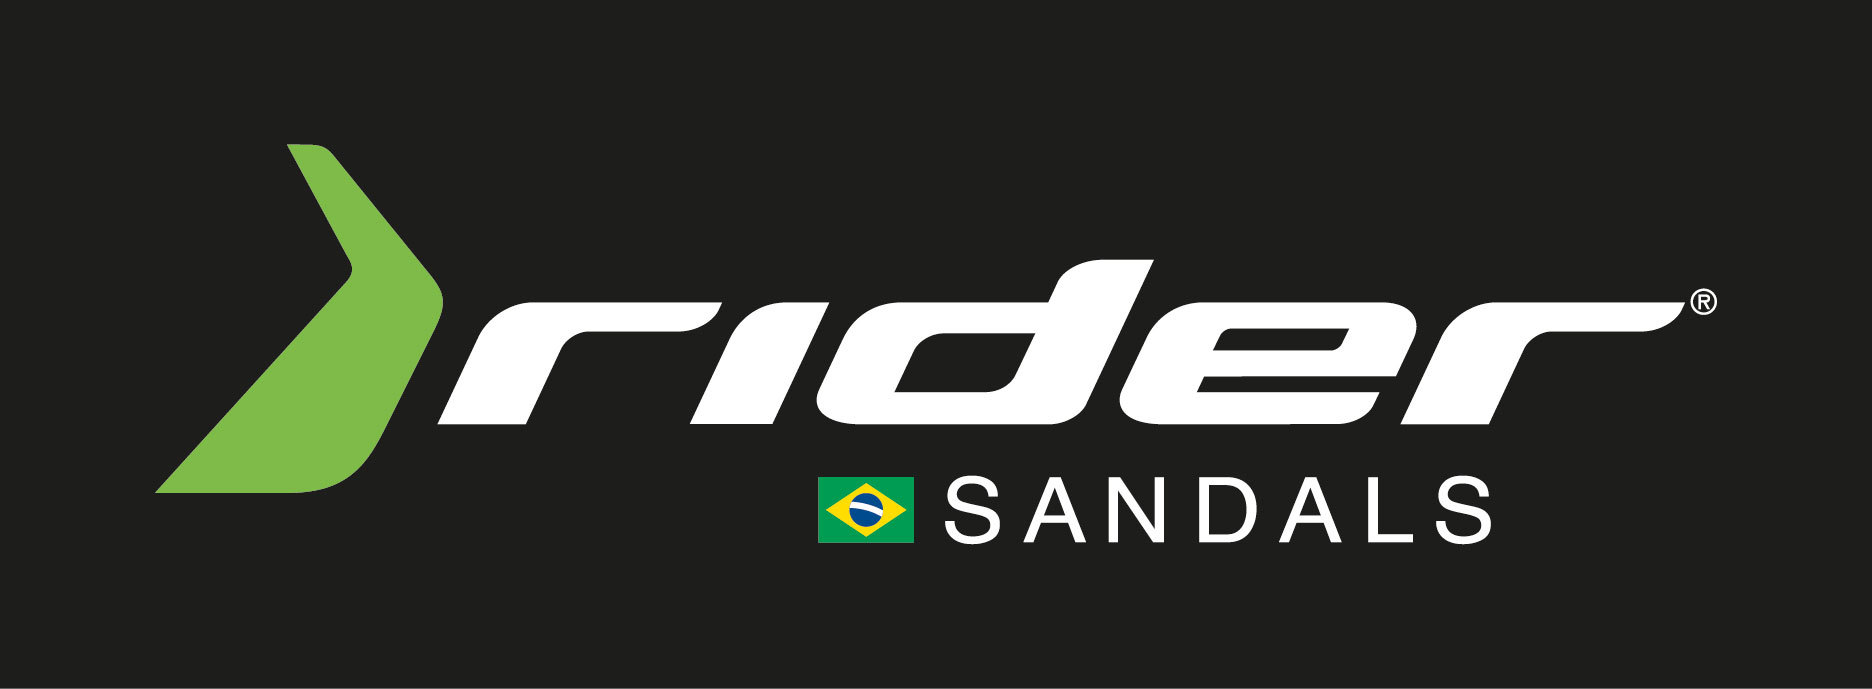 Wire To Art Sandals LifeBusiness Rider Brings 3uTlFJ5K1c